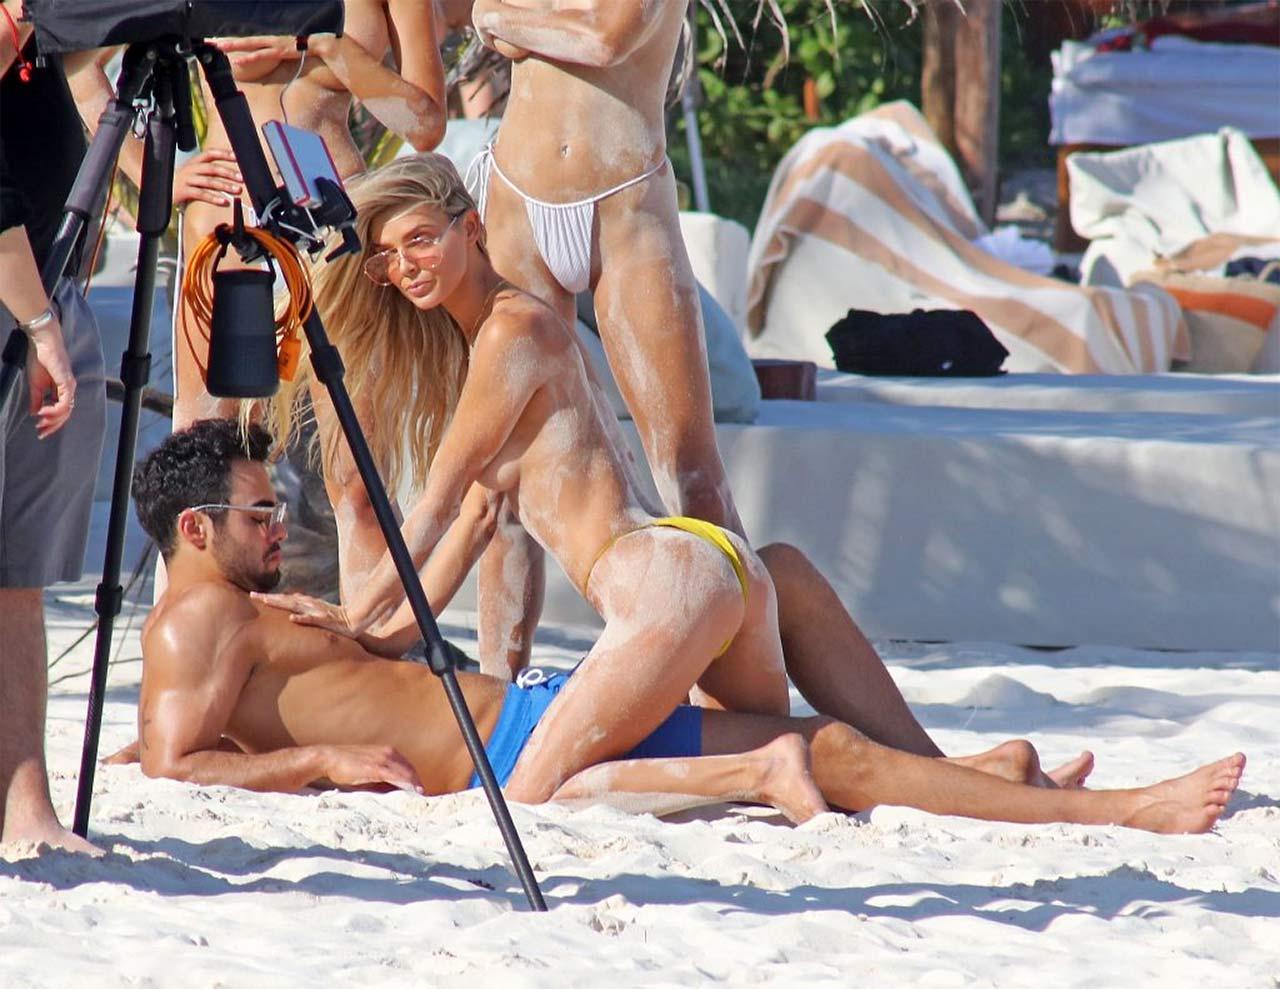 Sandy danielle knudson nude tits on the set milos raonics girlfriend is sexy nudes (63 photo)